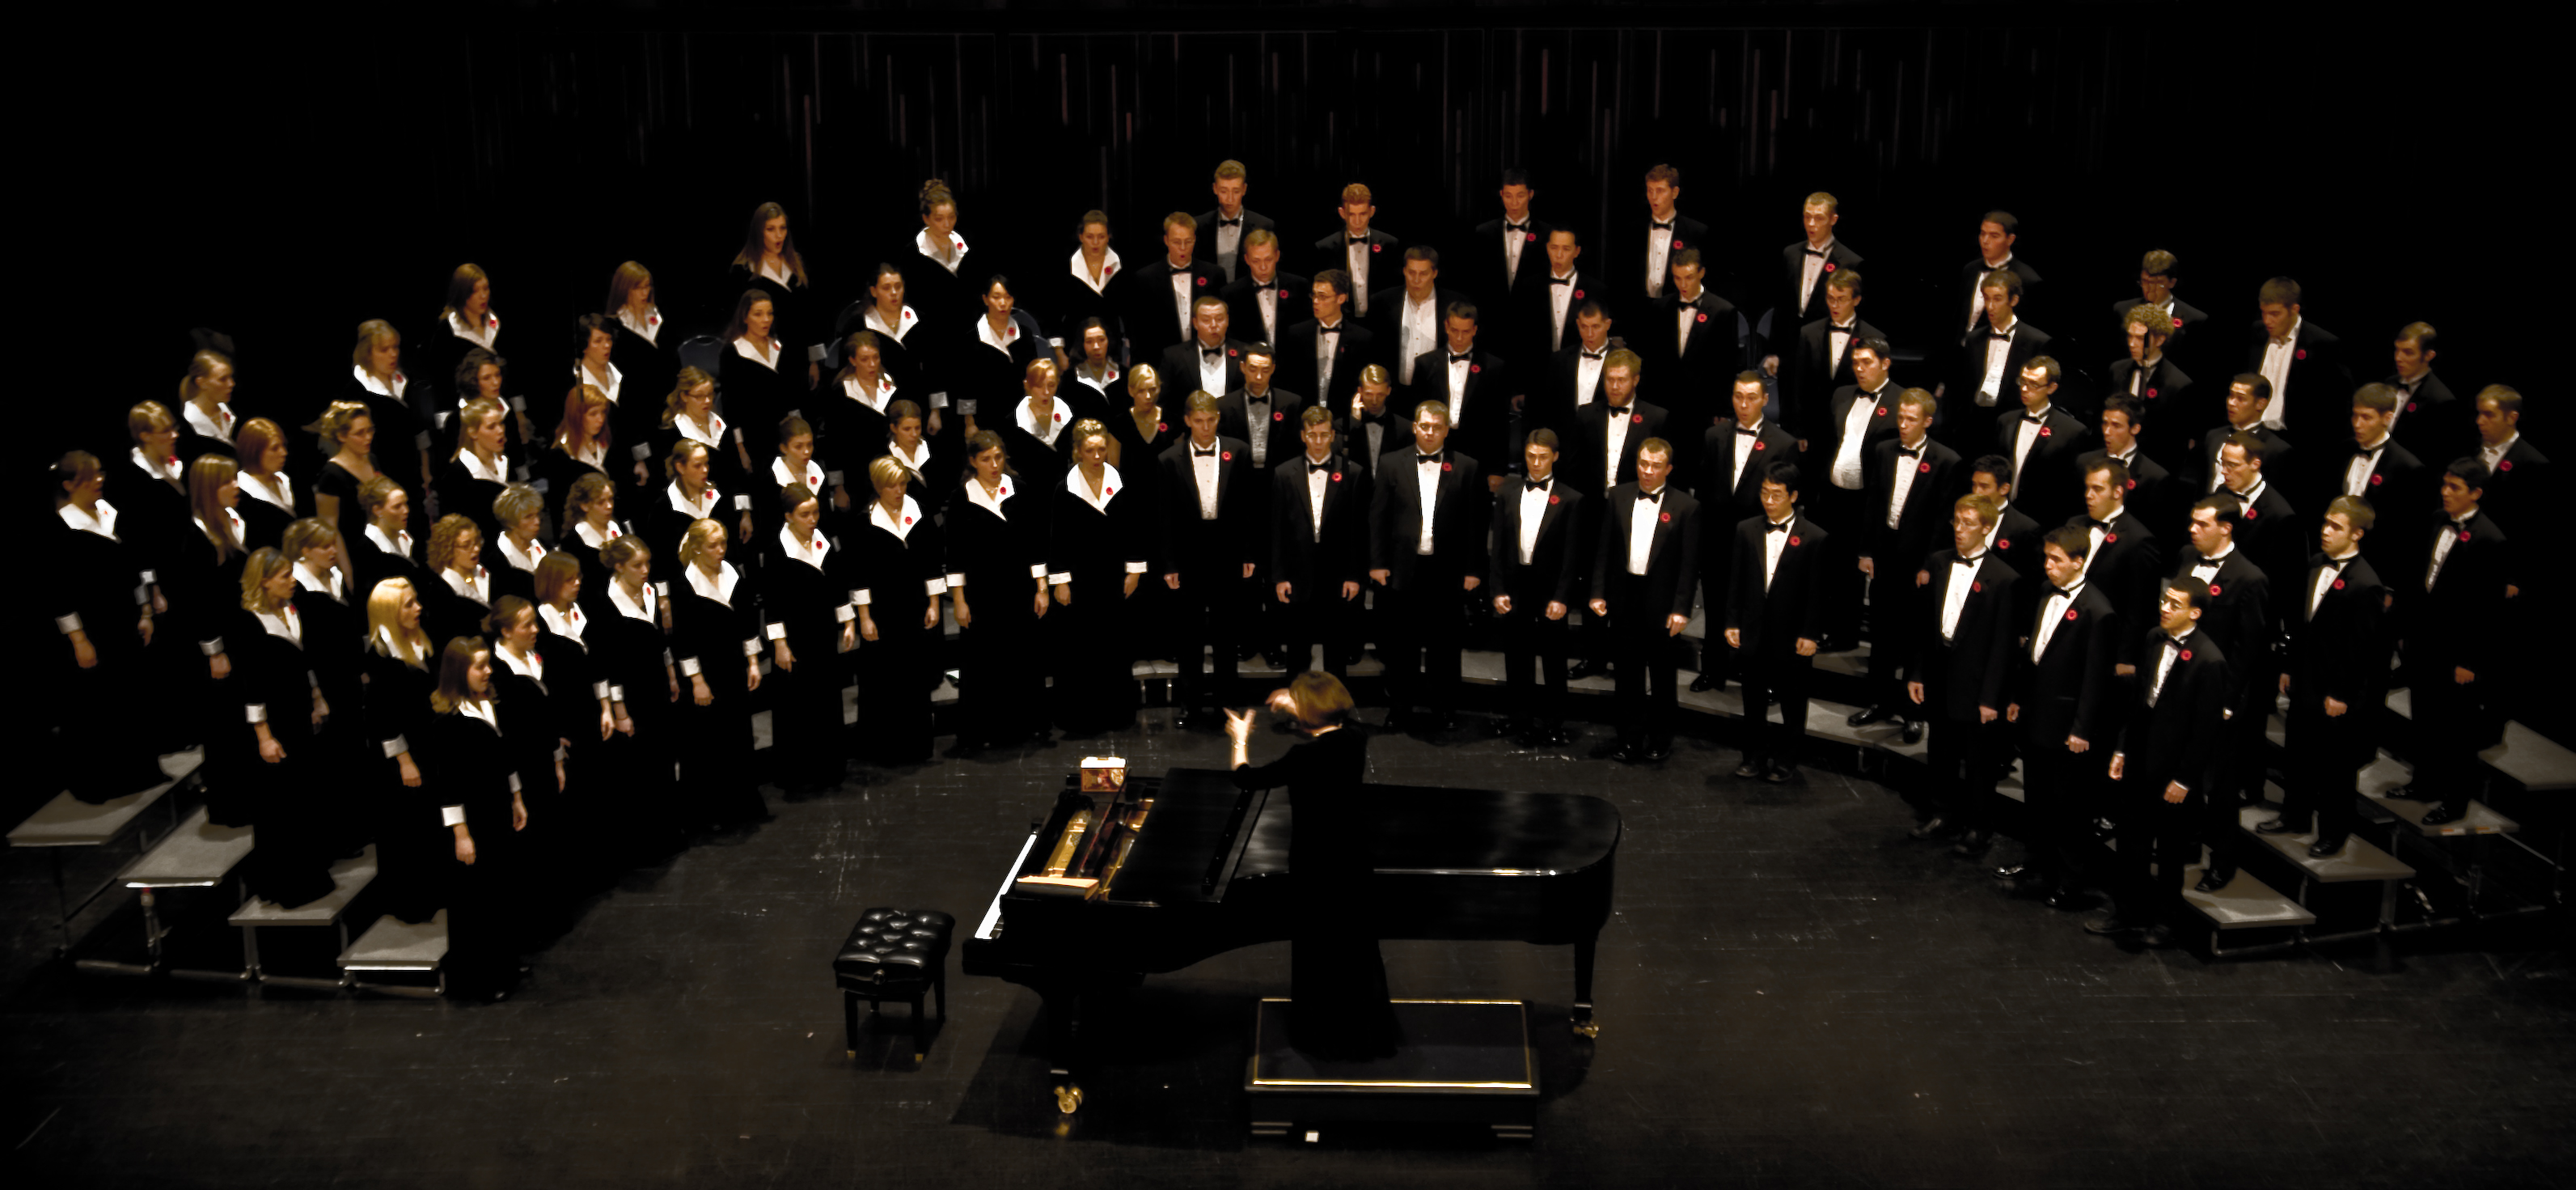 BYU_Concert_Choir_with_Poppies.jpg